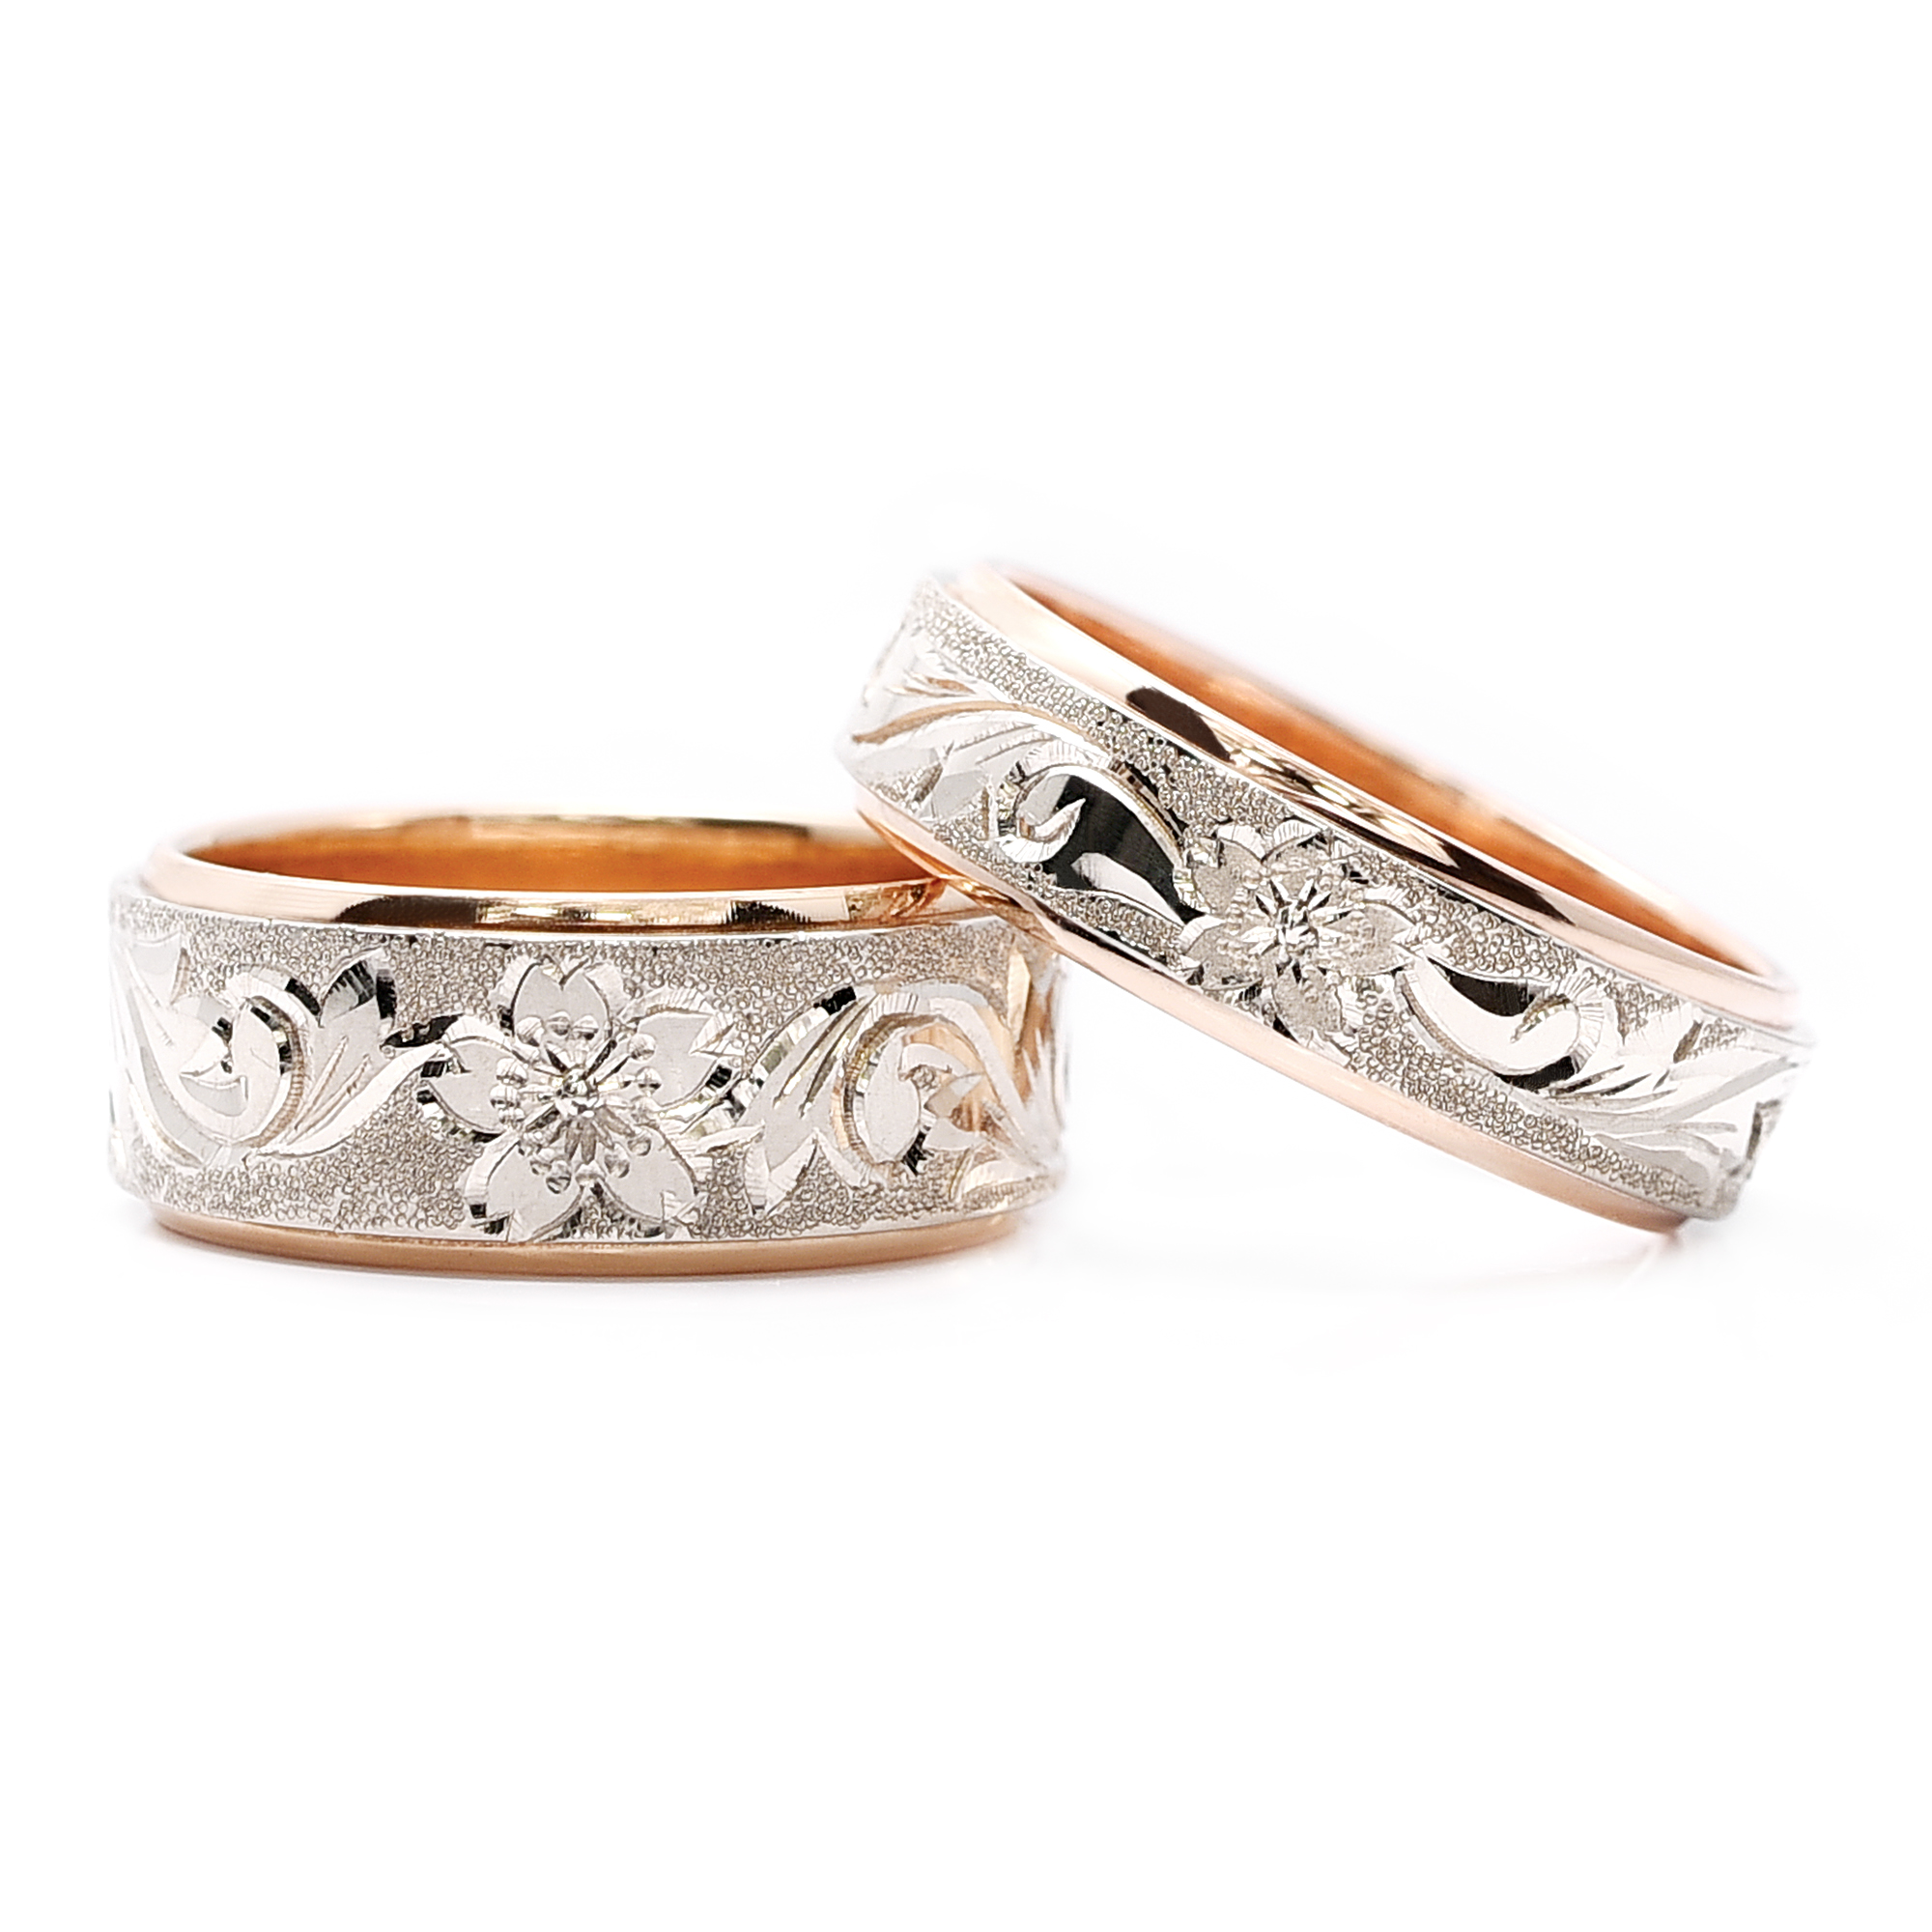 輪高崎工房の結婚指輪|桜NO3